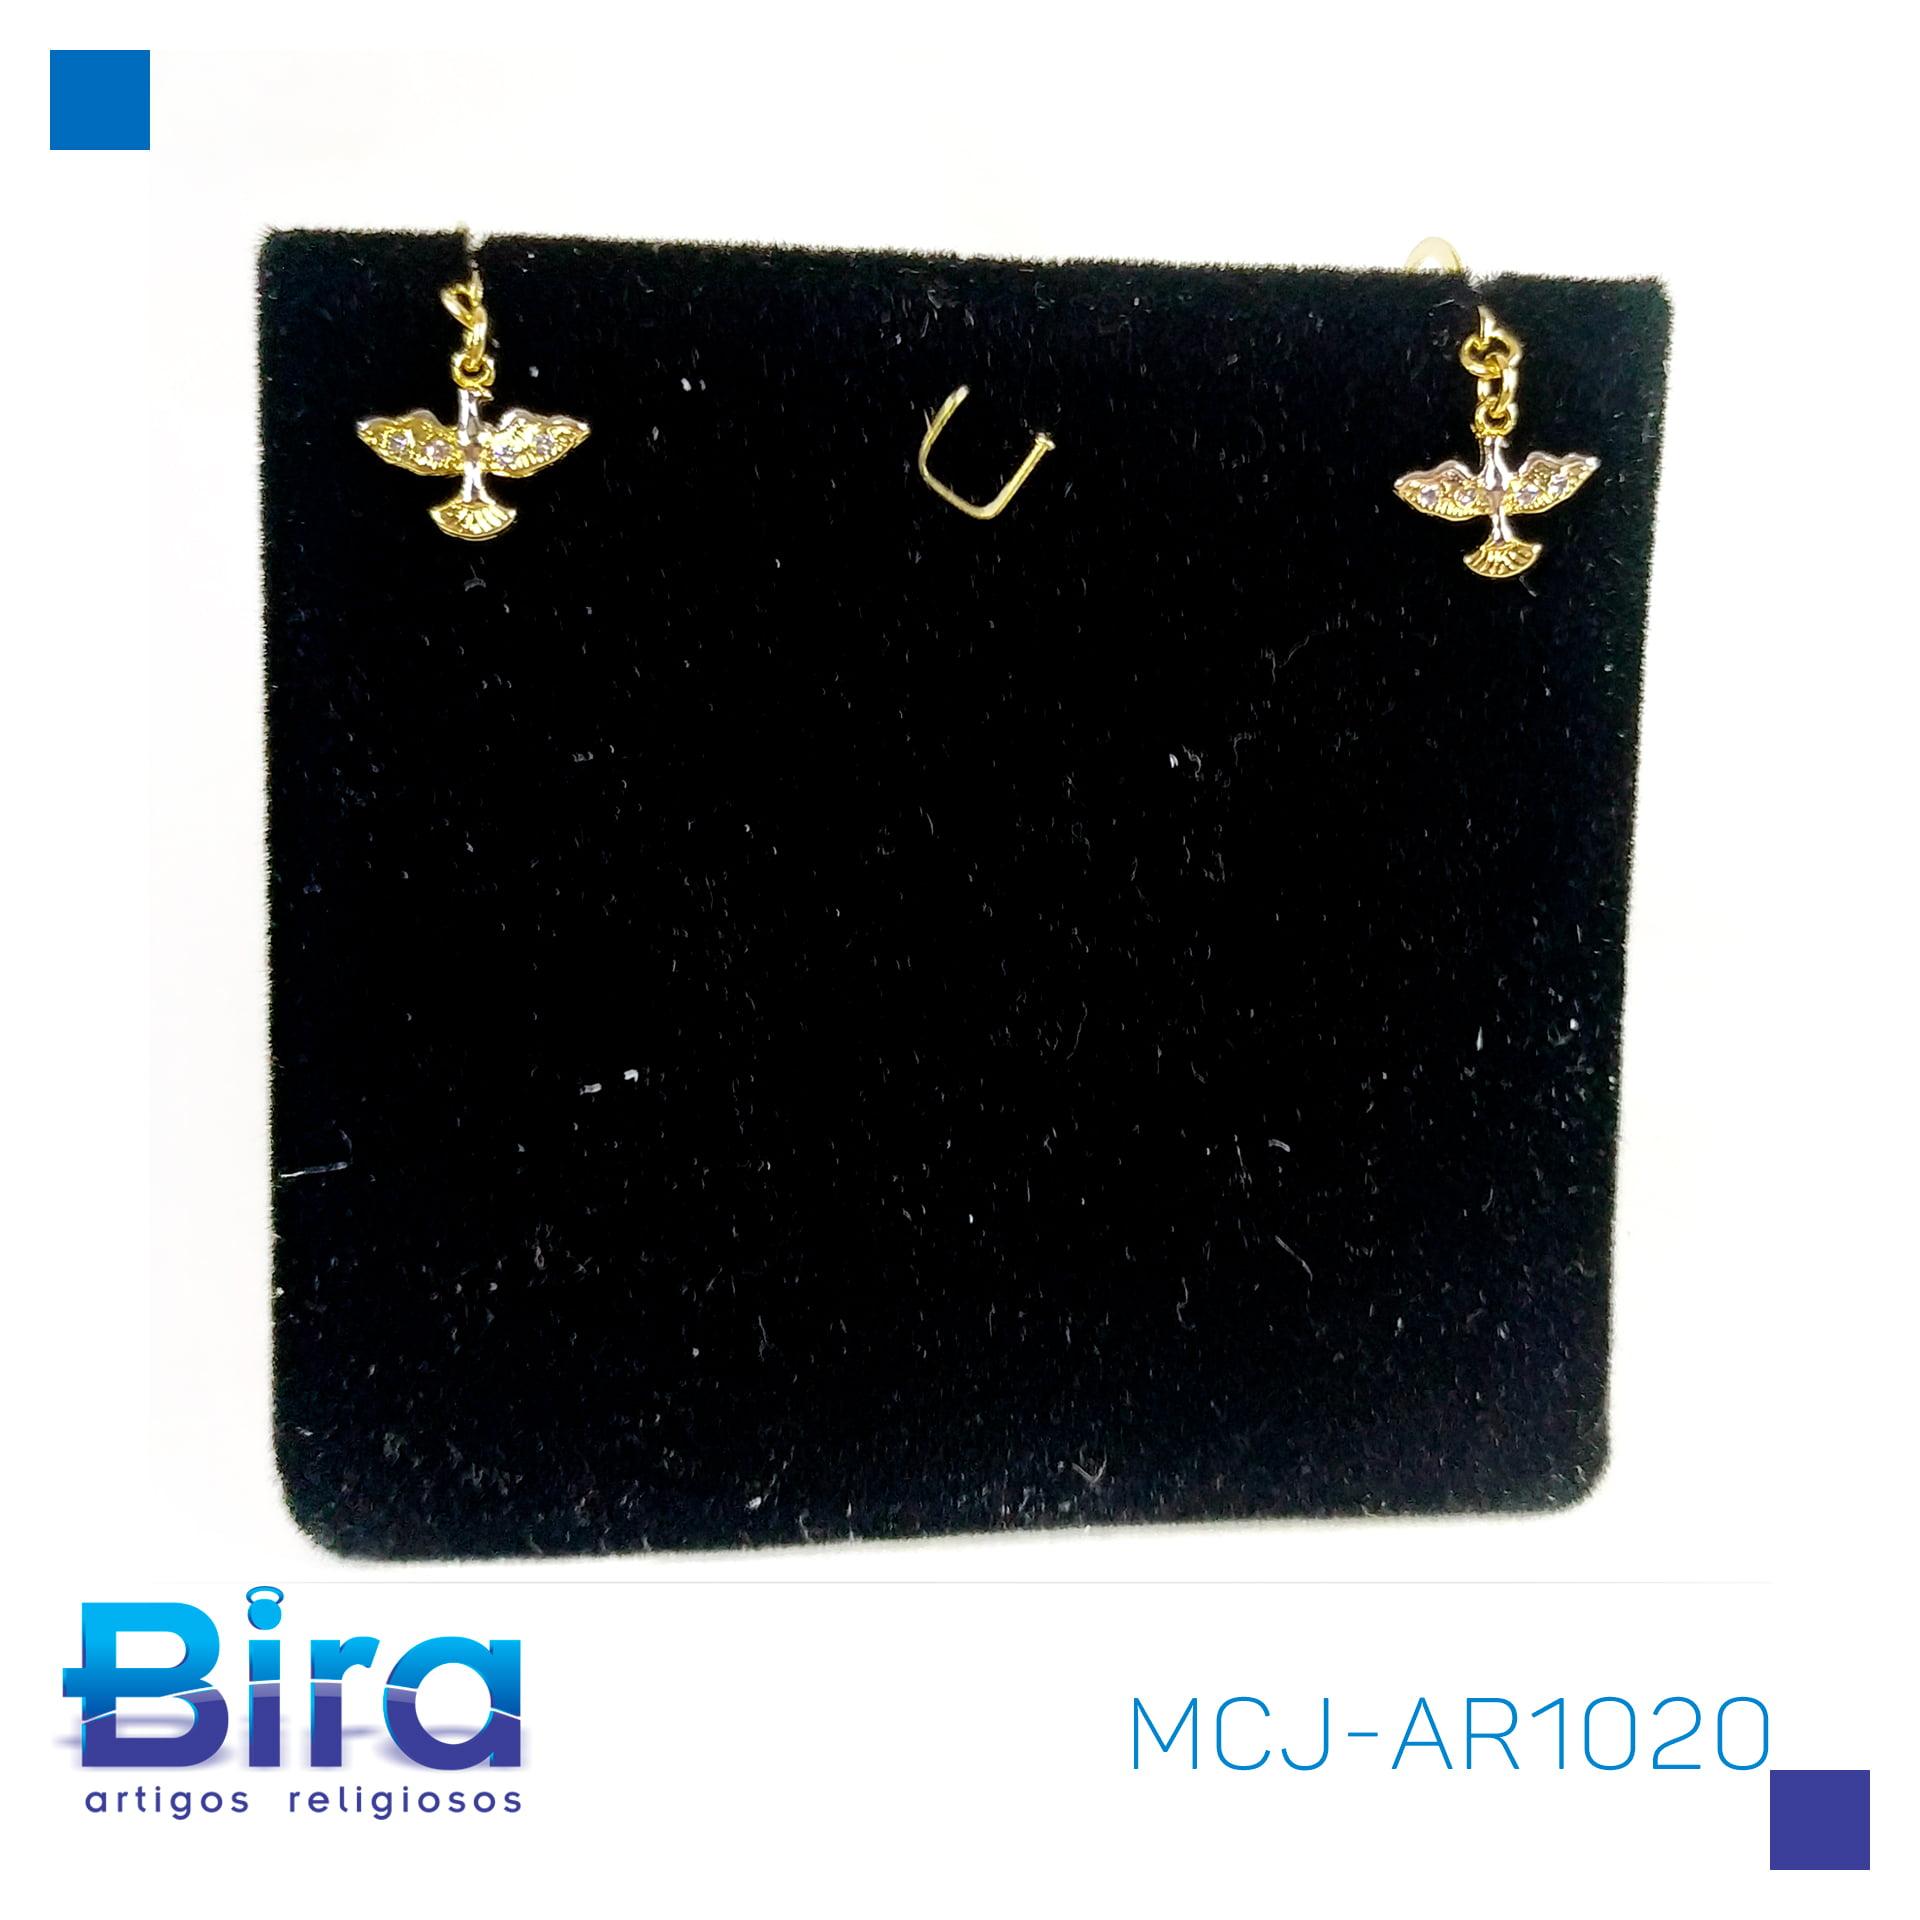 Bira Artigos Religiosos - BRINCO NS C/STRASS NV - CÓD. MCJ-AR1020